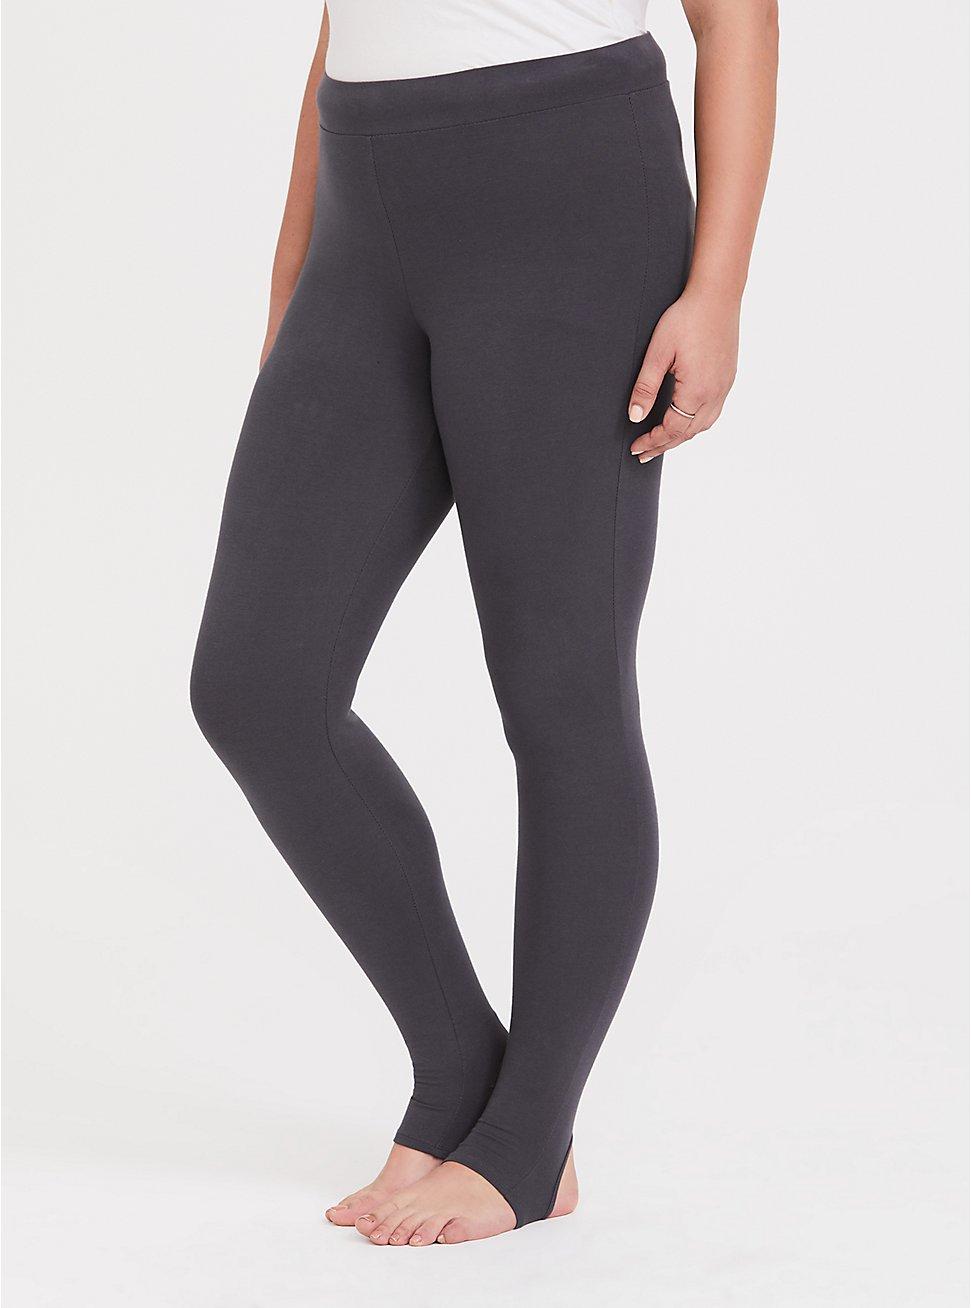 Premium Legging - Stirrup Hem Grey, GREY, hi-res